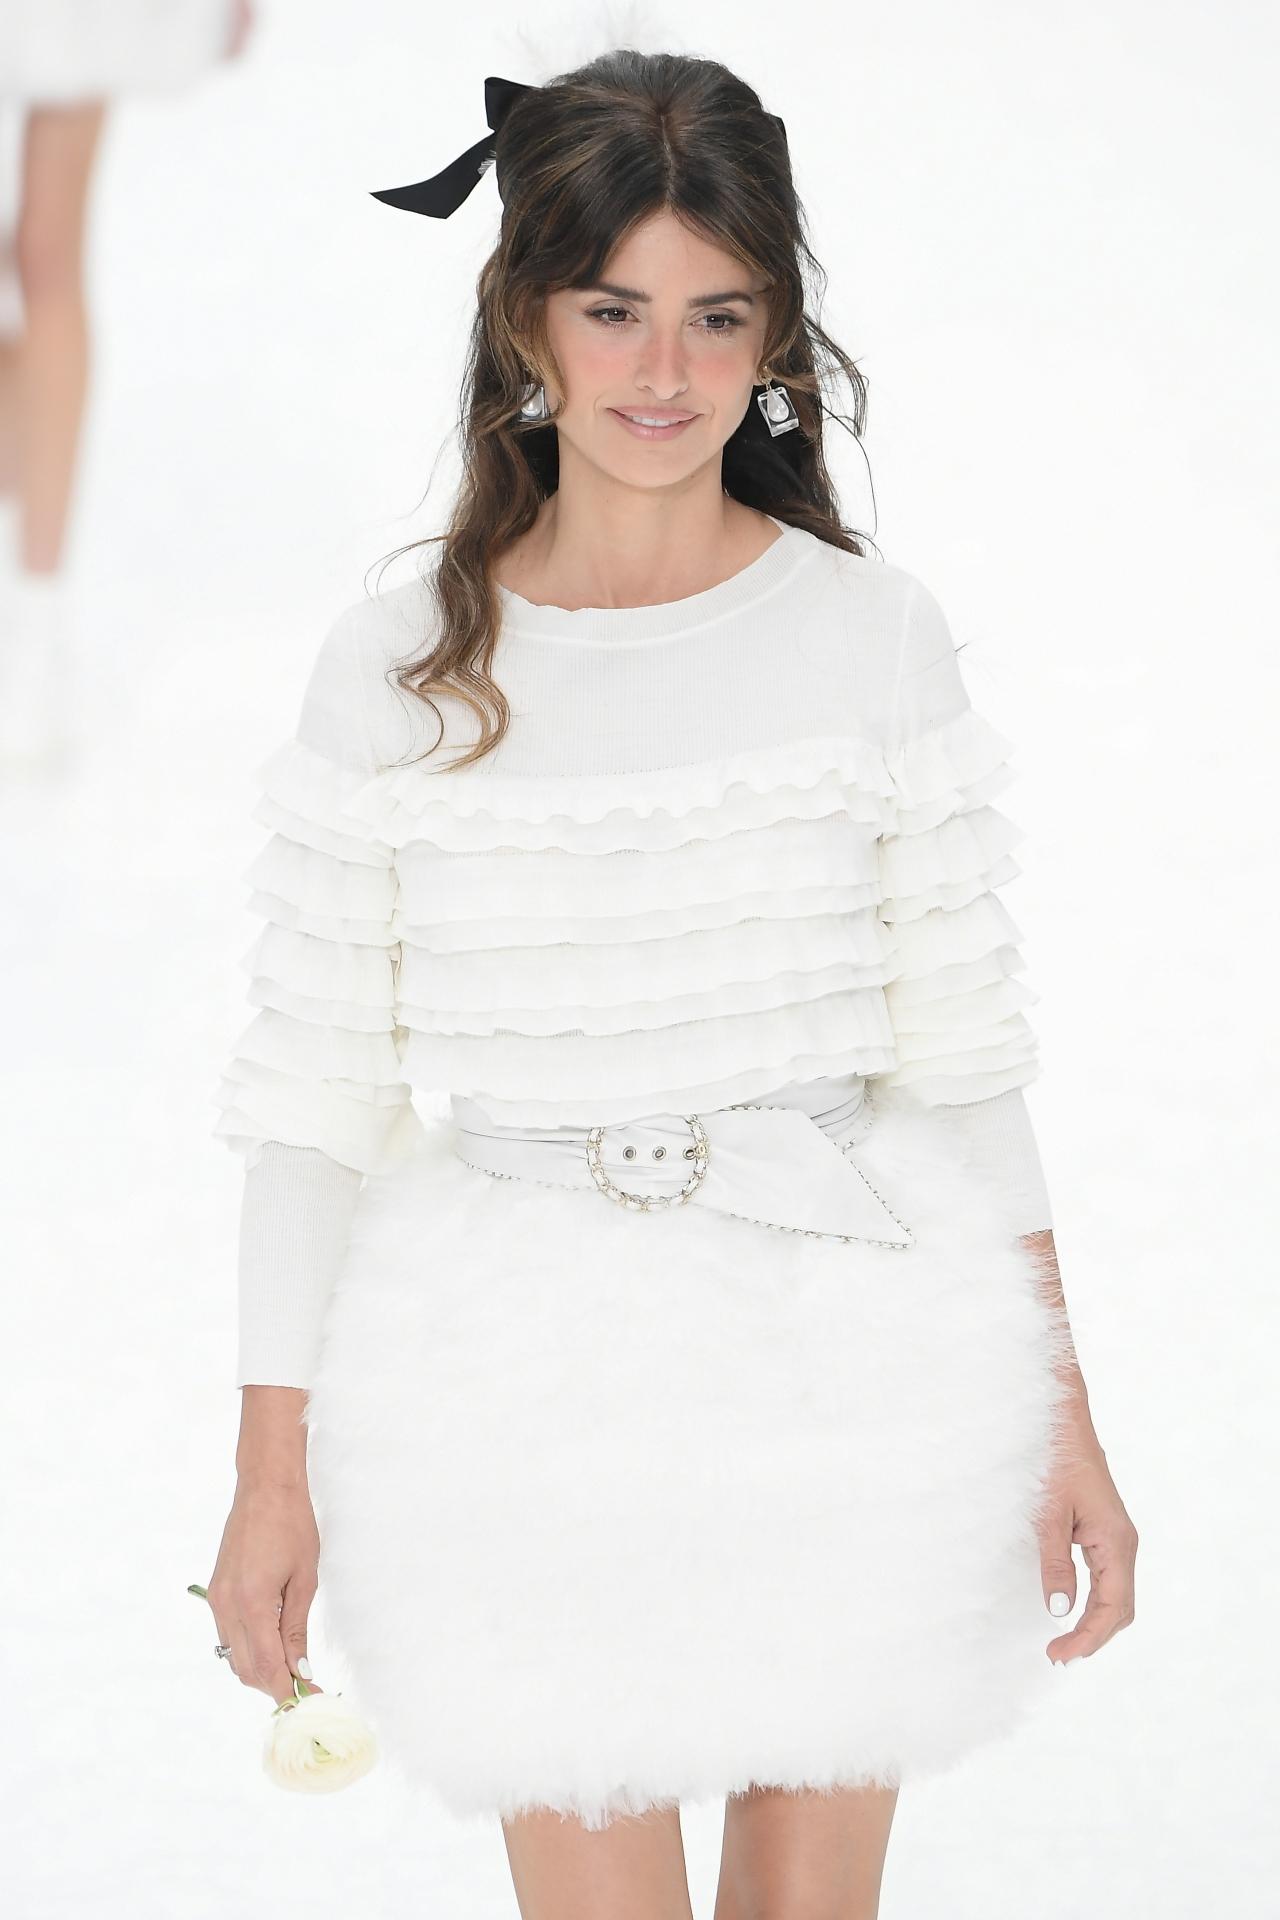 the latest 7814a 47642 Chanel: l'ultima sfilata firmata Karl Lagerfeld - Radio ...